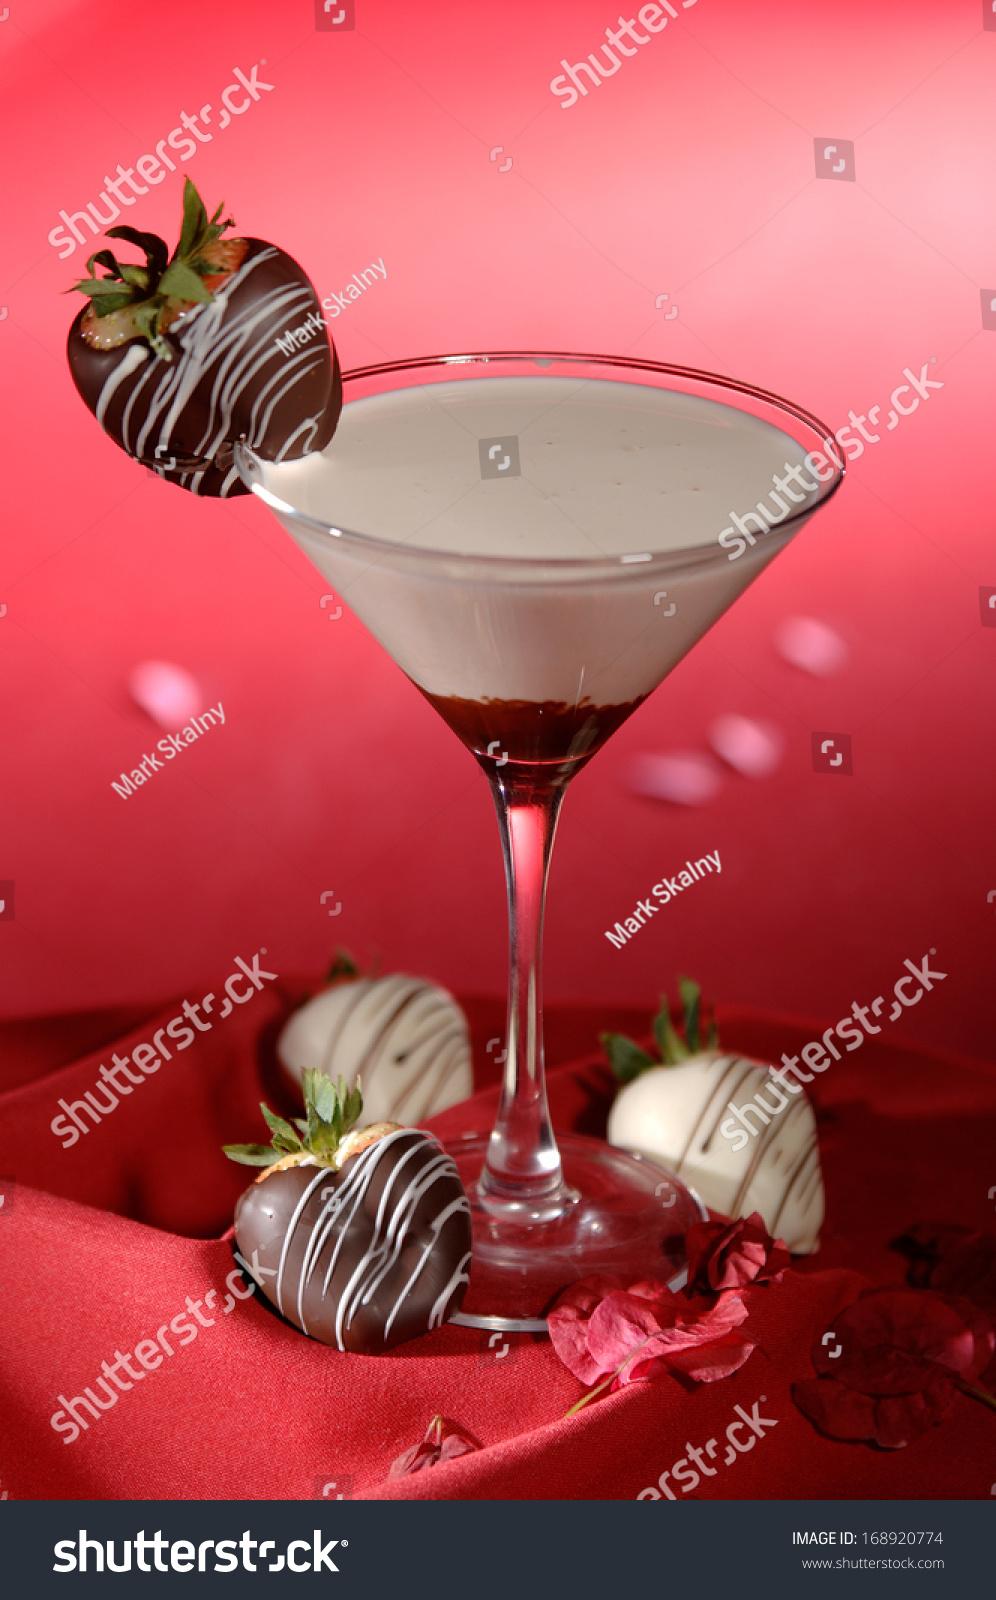 White Chocolate Martini Cocktail Chocolate Covered Stock Photo ...